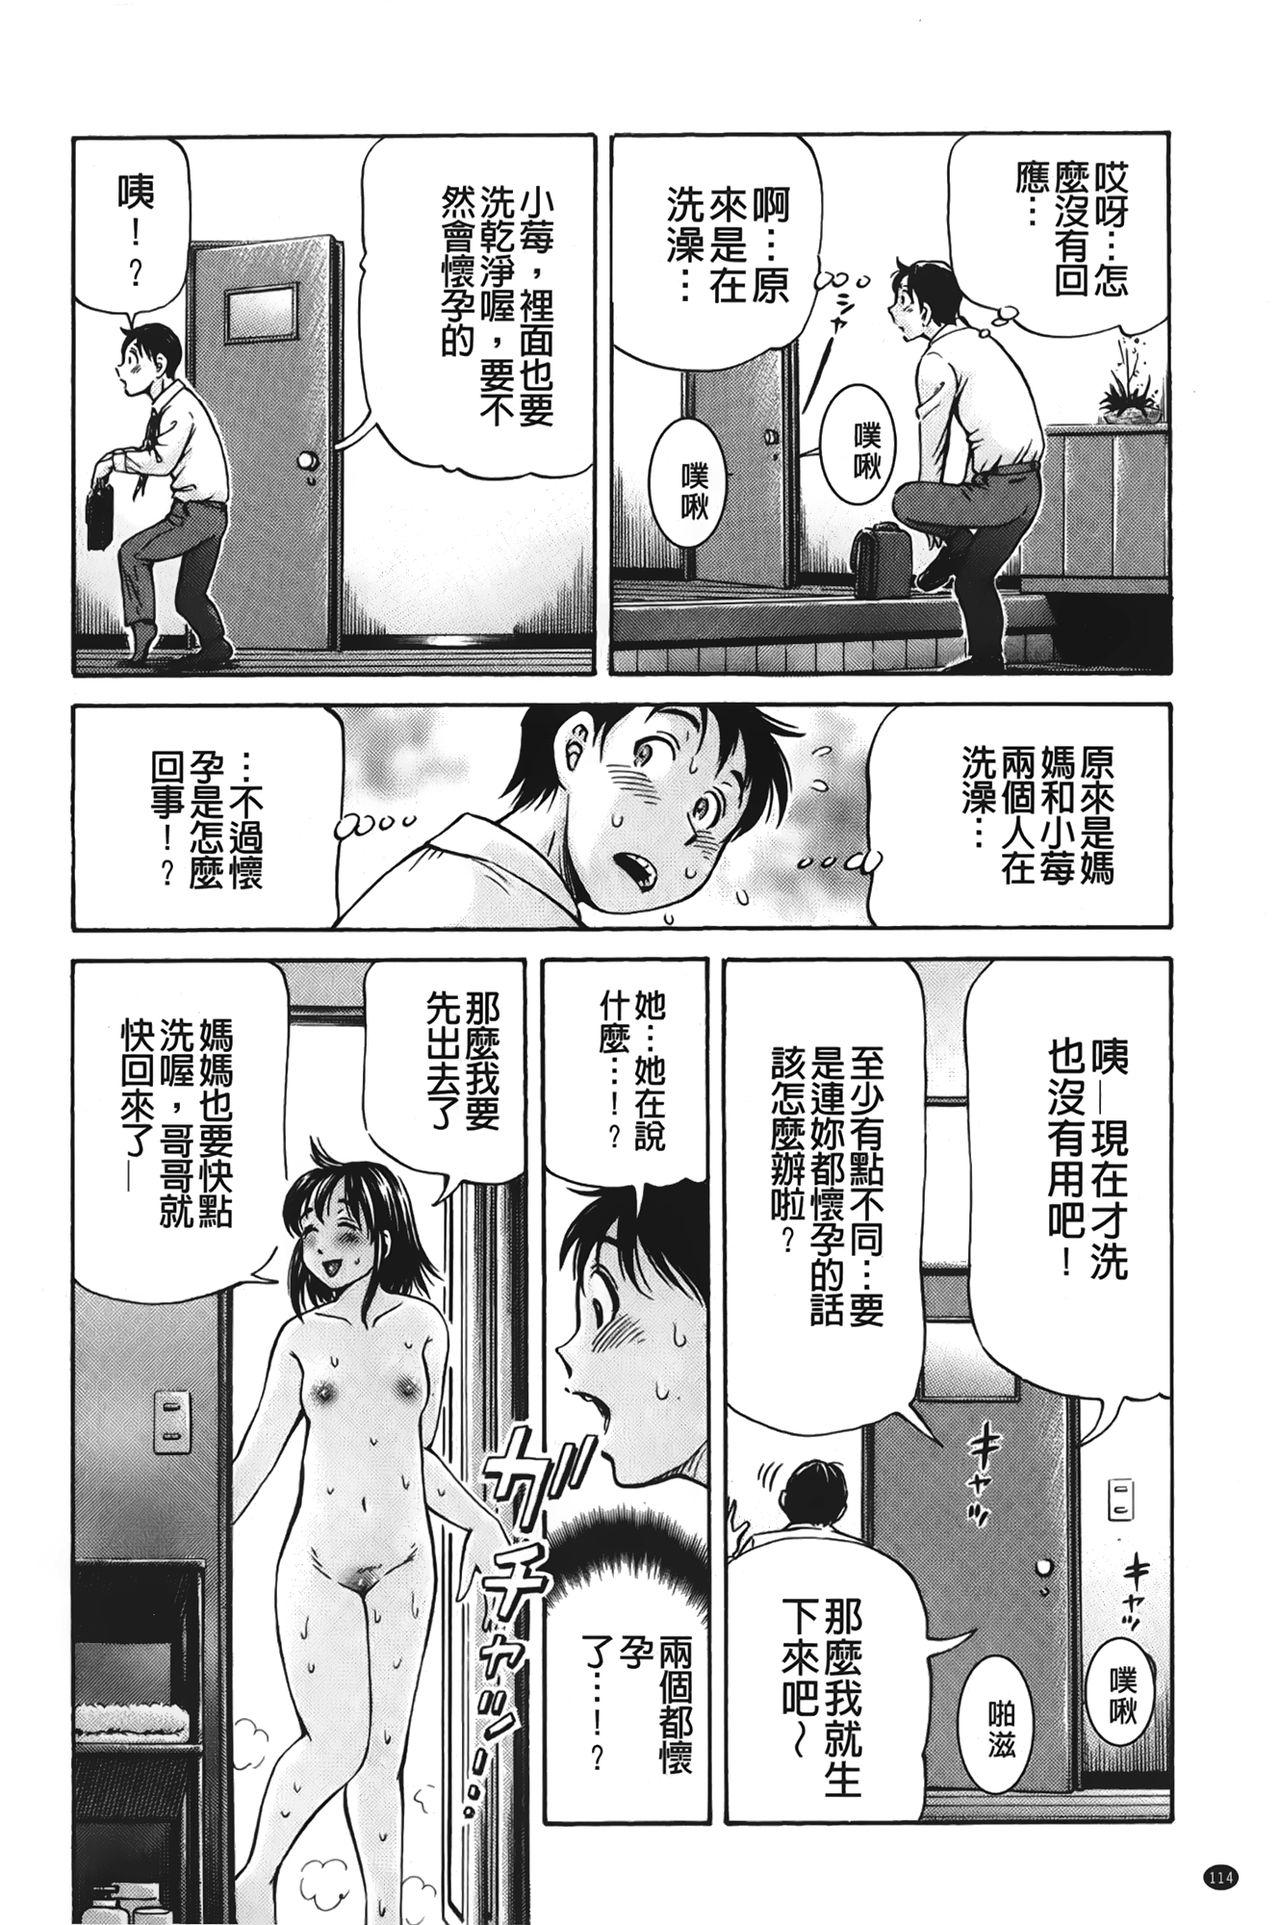 pookori meikingu | 懷孕少女的製造者 114